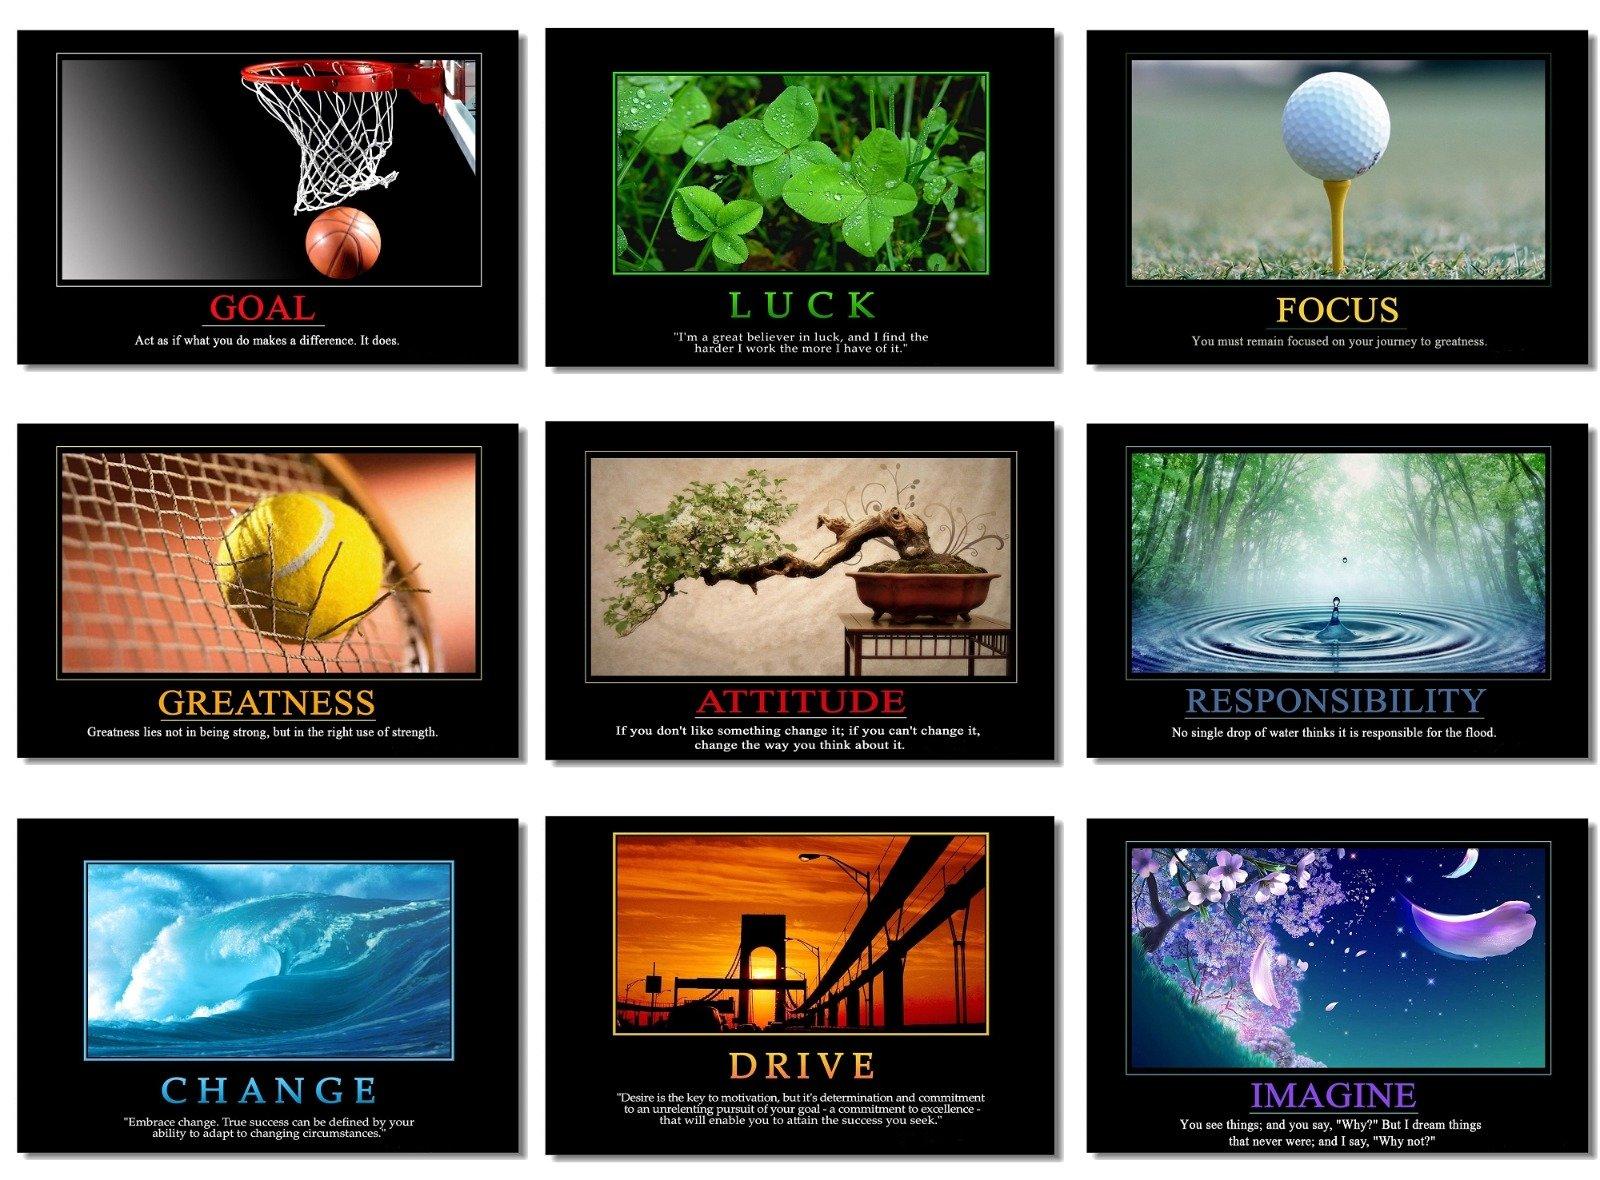 9x Poster Motivational Self Positive Office Quotes Inspirational Success Teamwork Dream Focus Responsibility Prints 20x13'' (50x33cm) E397(01-09)